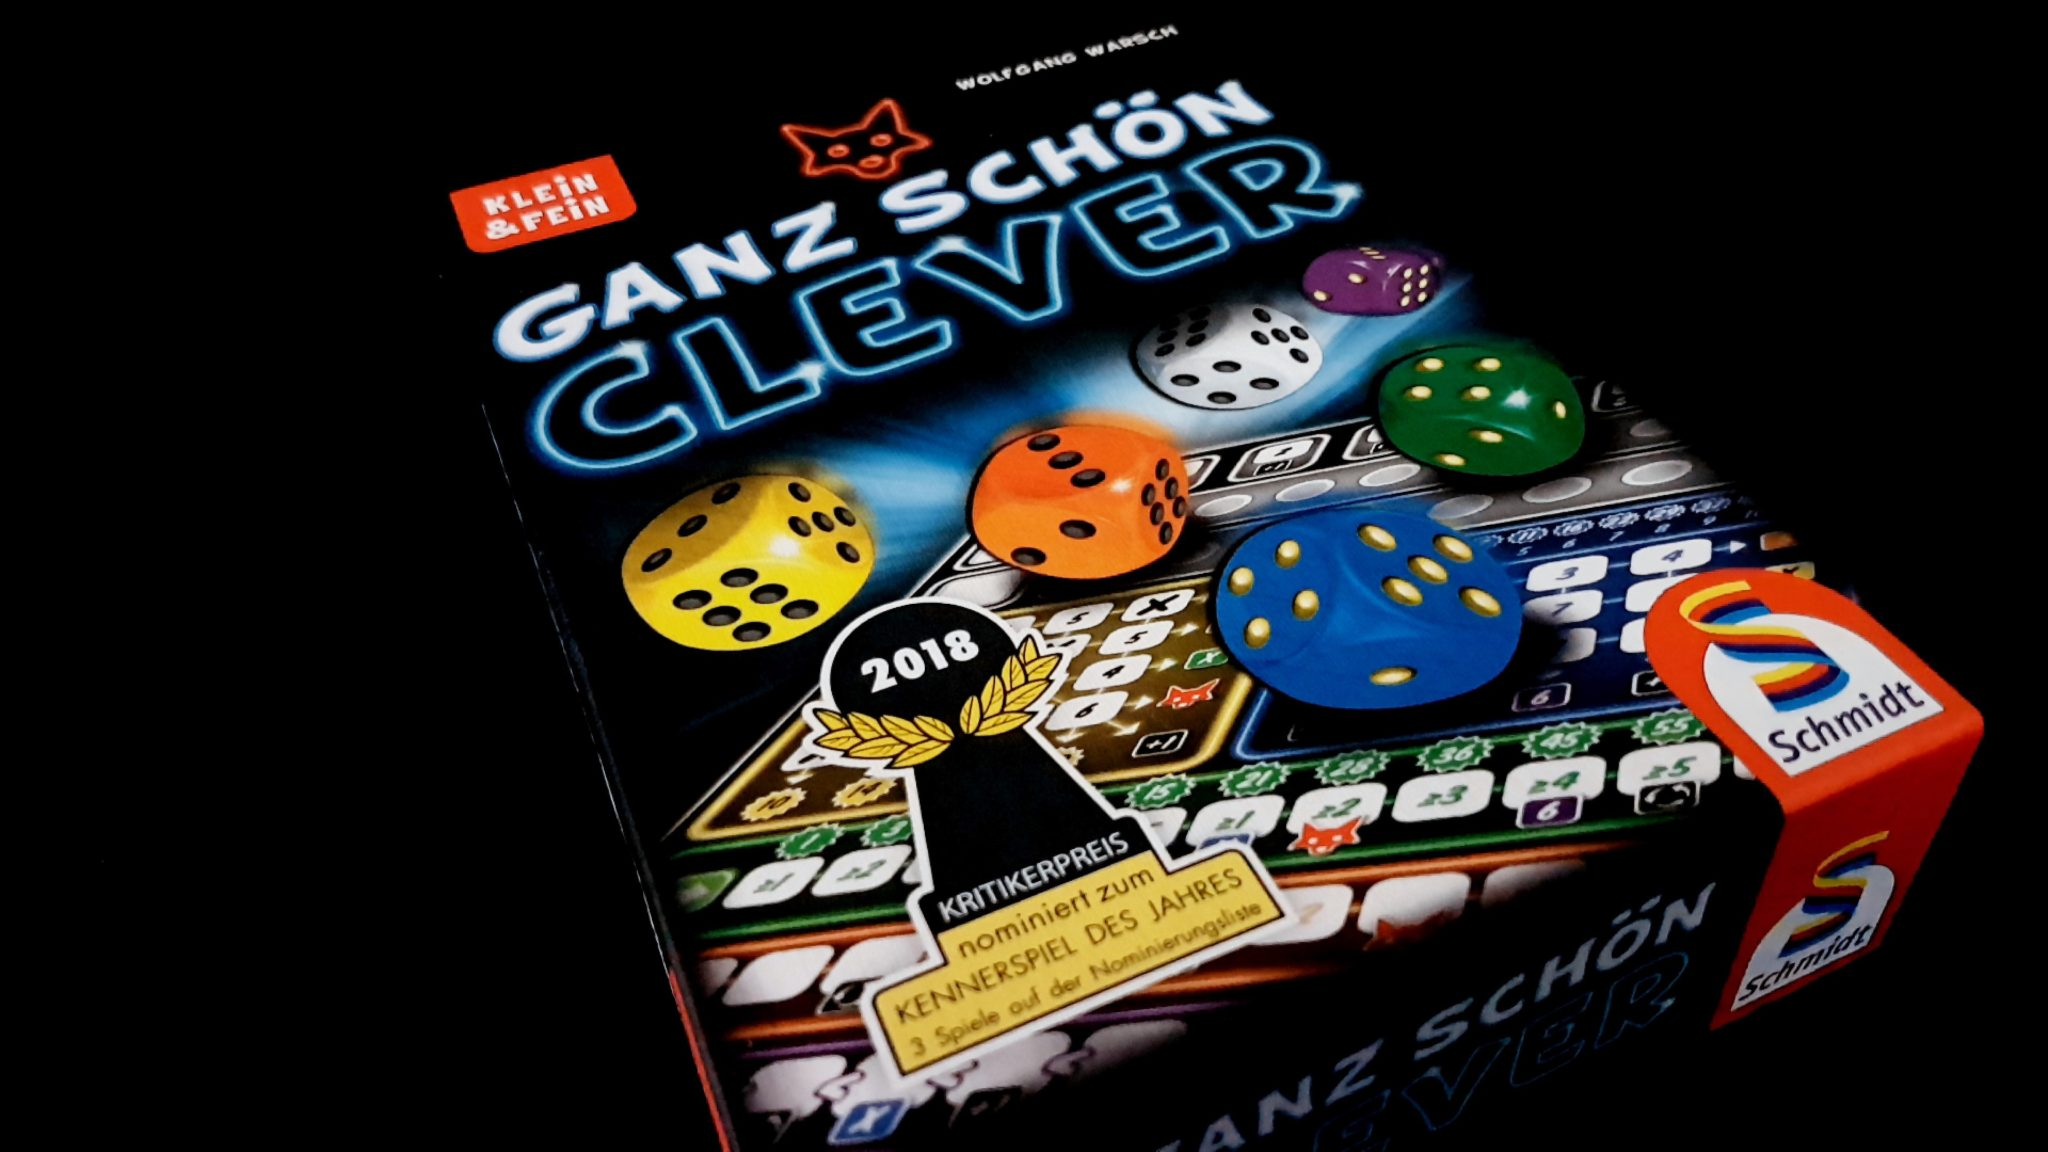 Ganz box